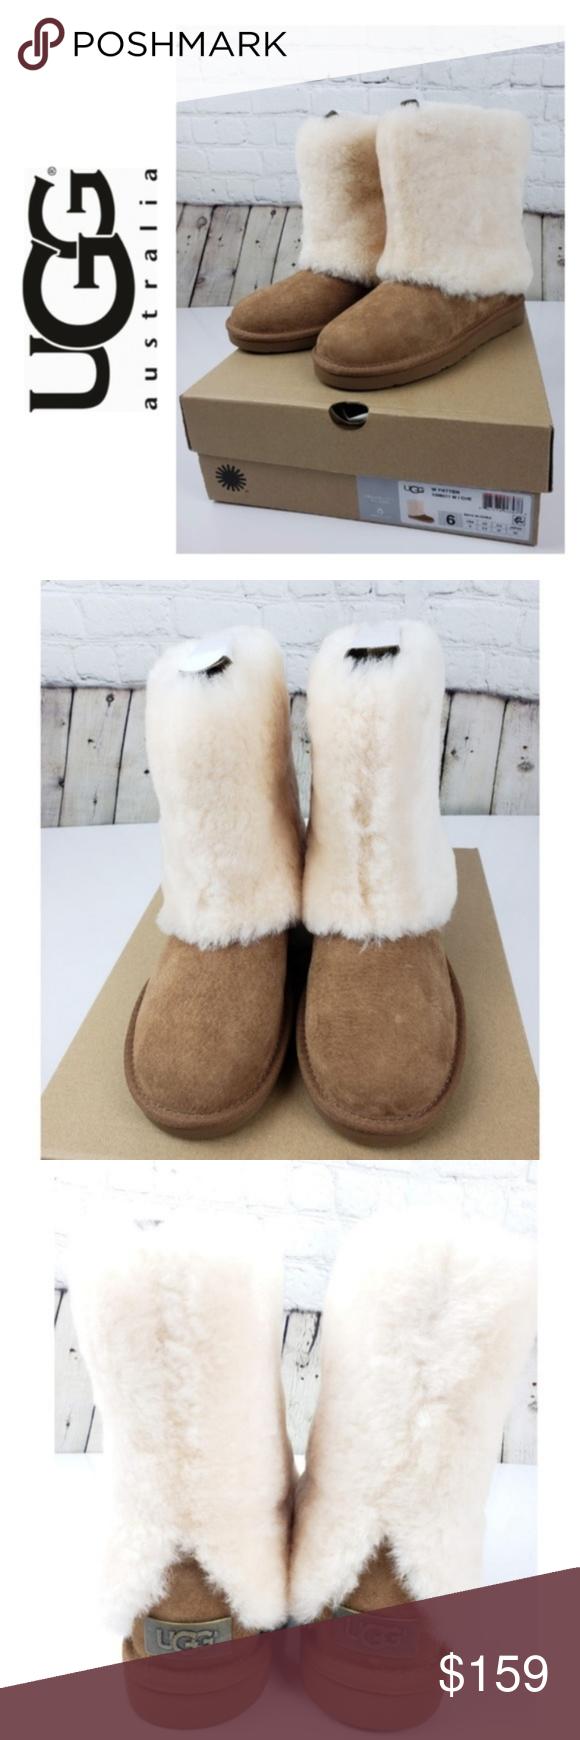 752a276de5 UGG Boots Chestnut Sheepskin Cuff Boot Size 6 NWT Brand New with Box Women's  Uggs Australia